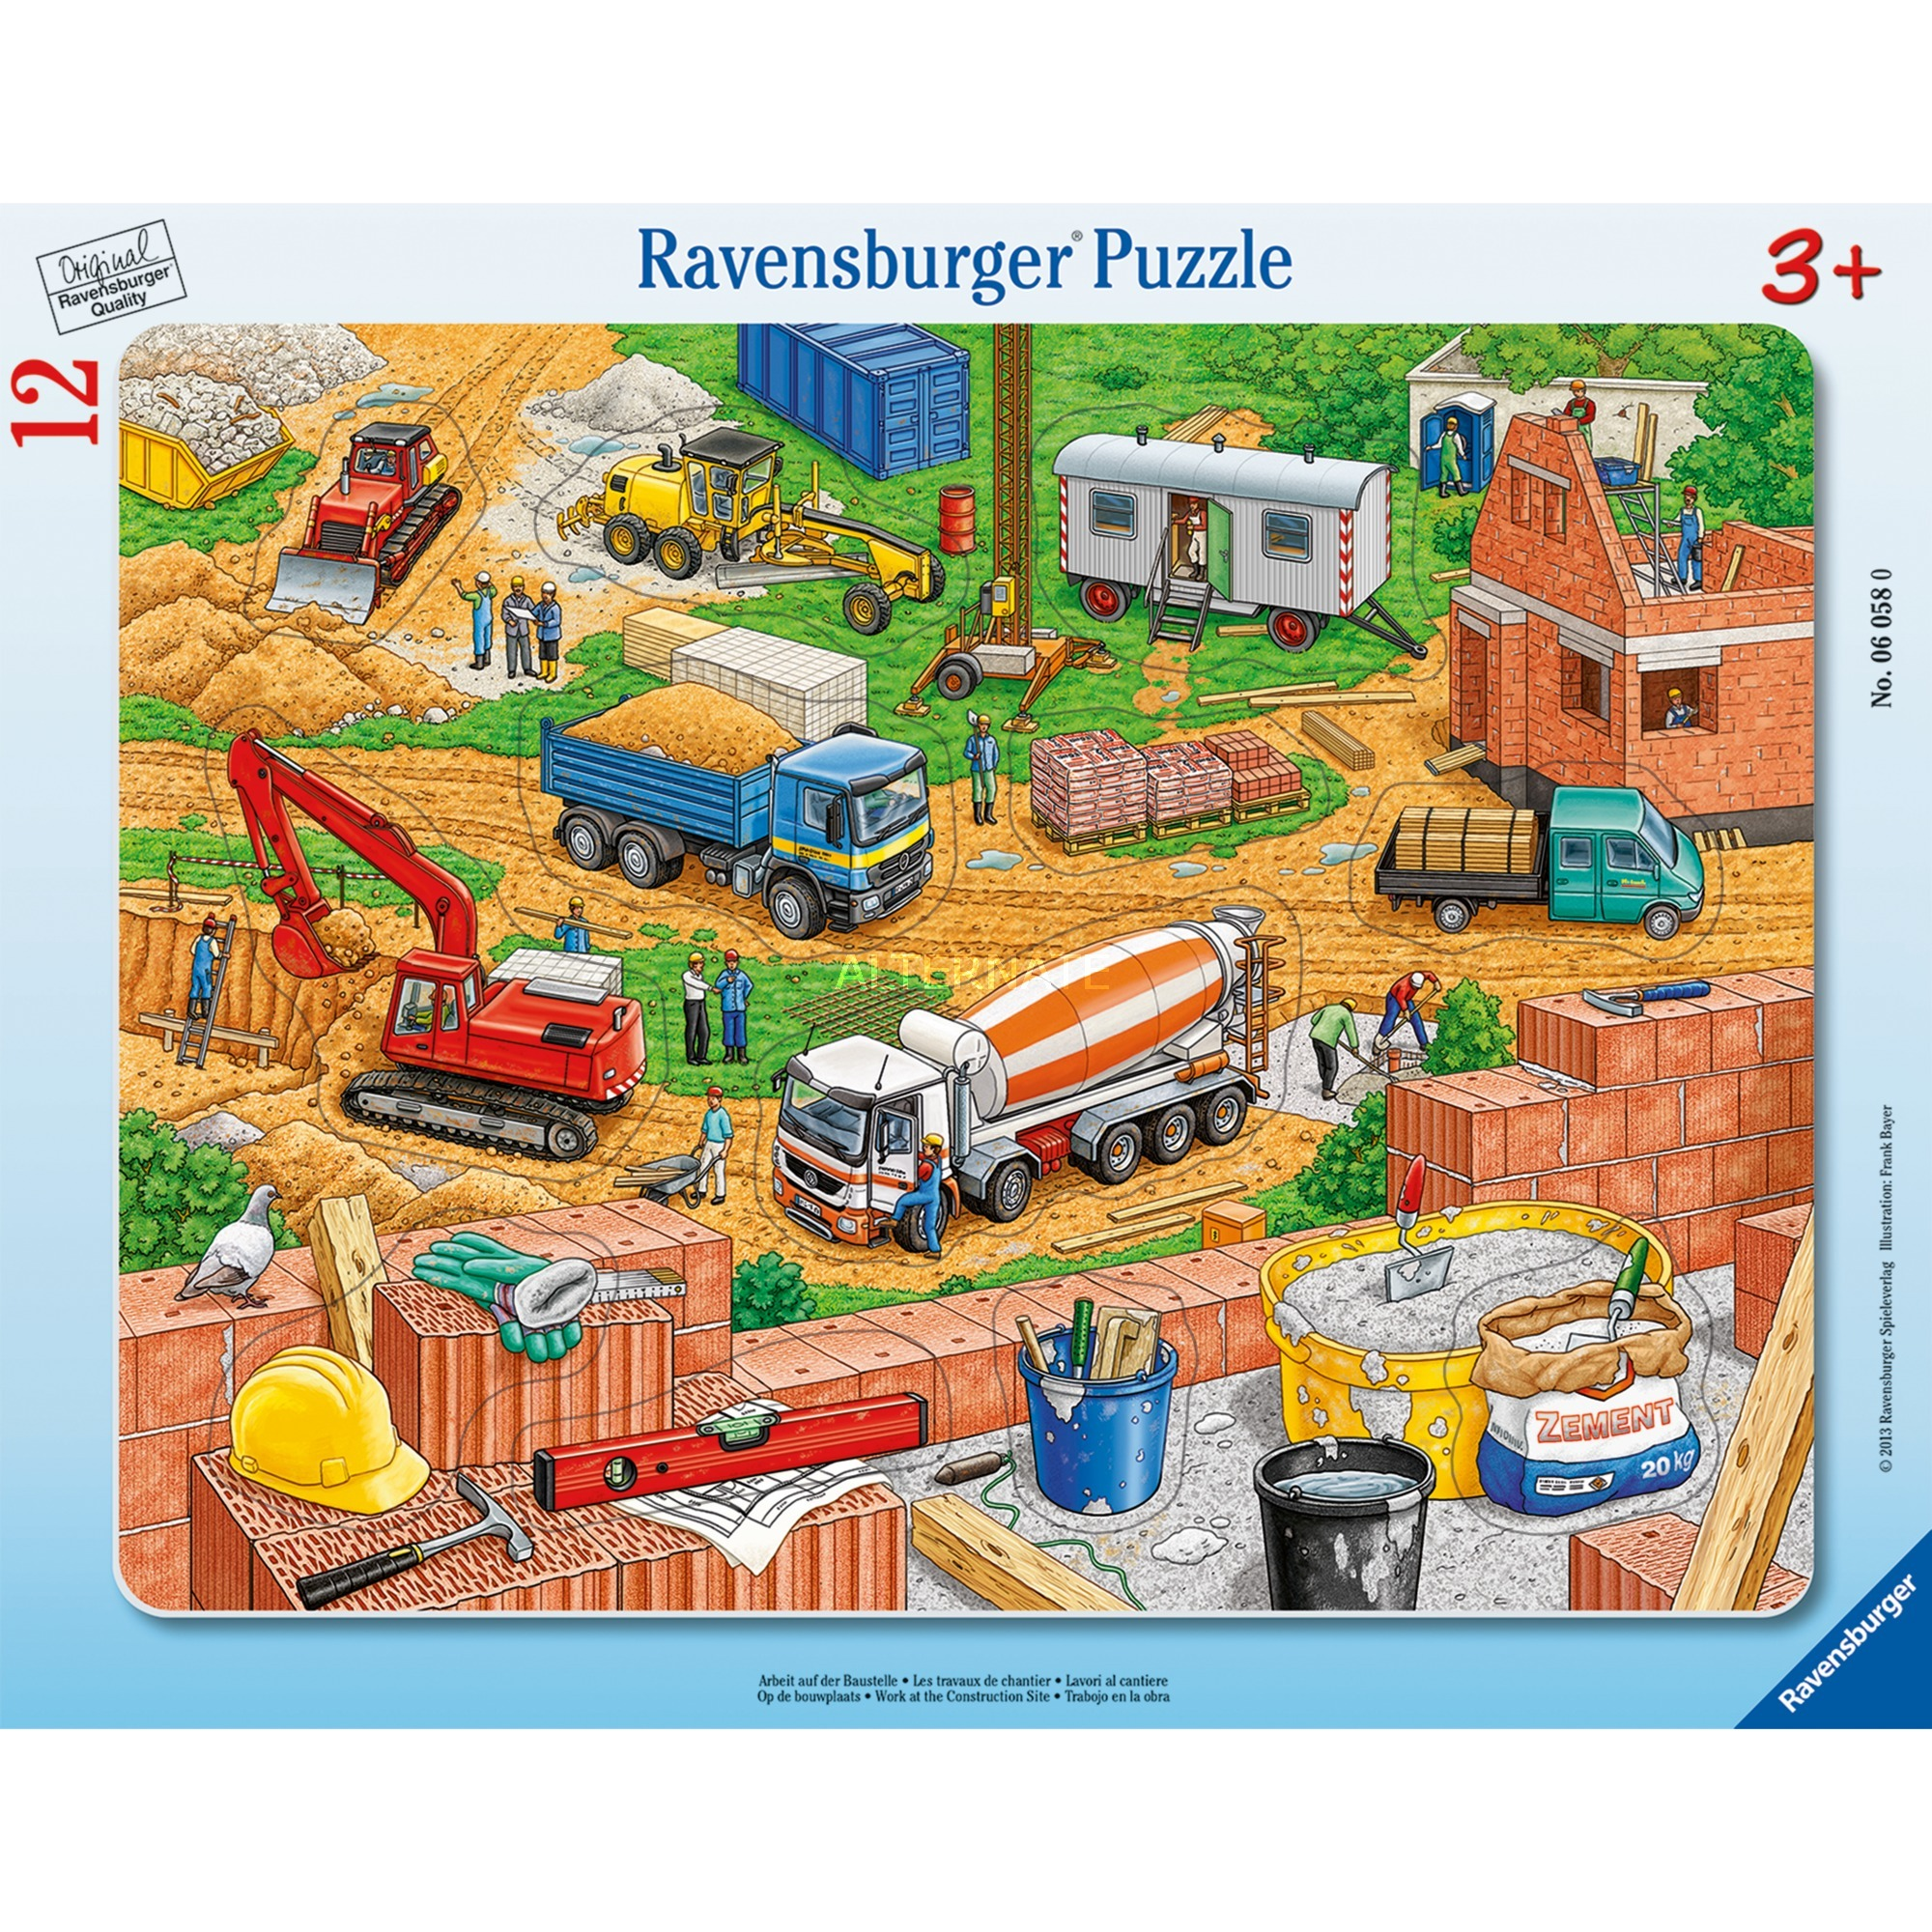 00.006.058 puzzle 12 pieza(s)